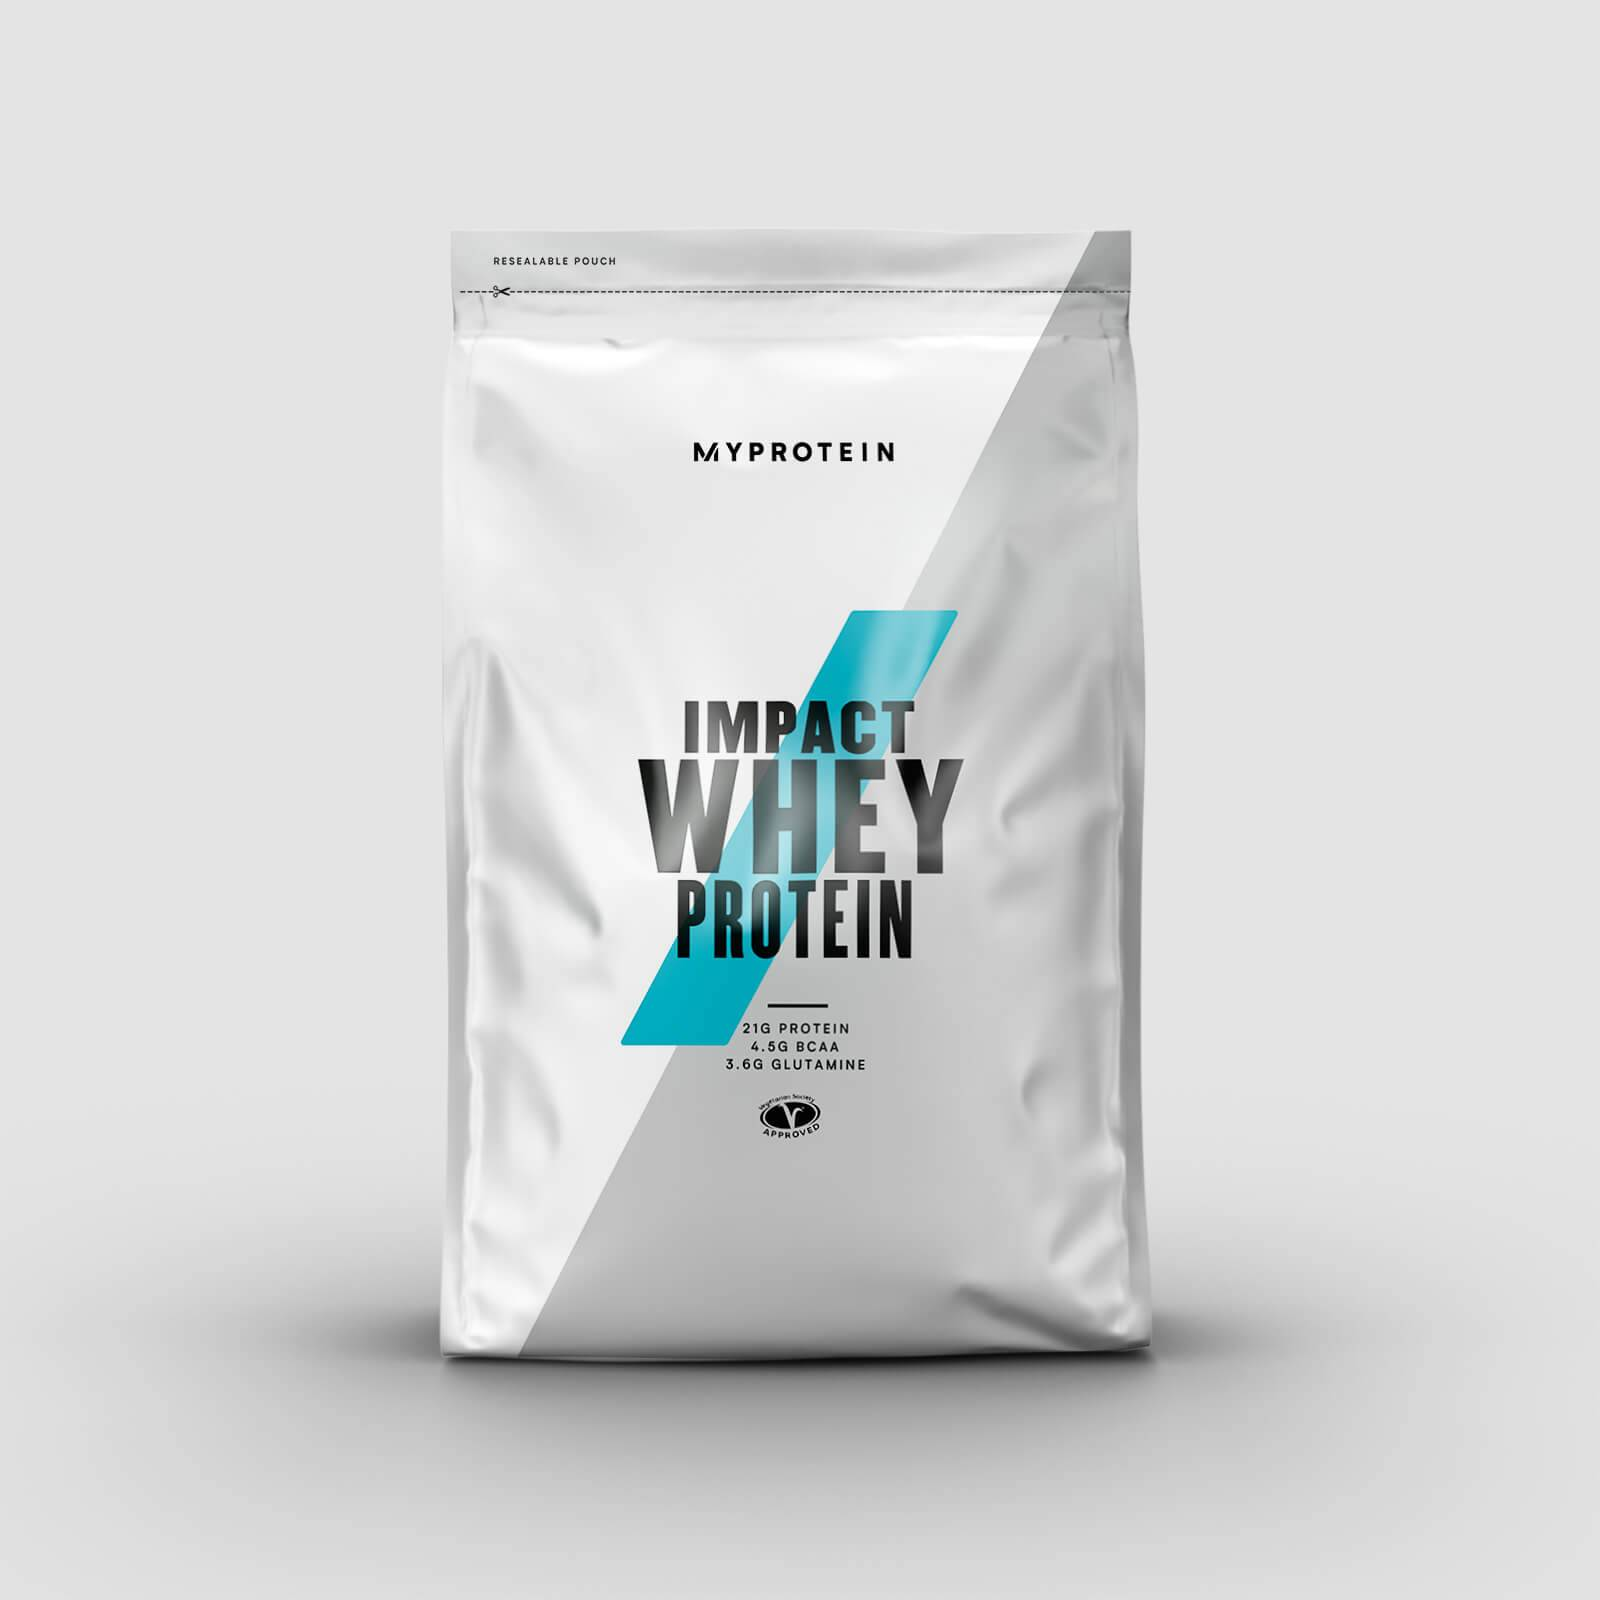 Myprotein Impact Whey Protein - 2.5kg - Chocolat-Noix de Coco